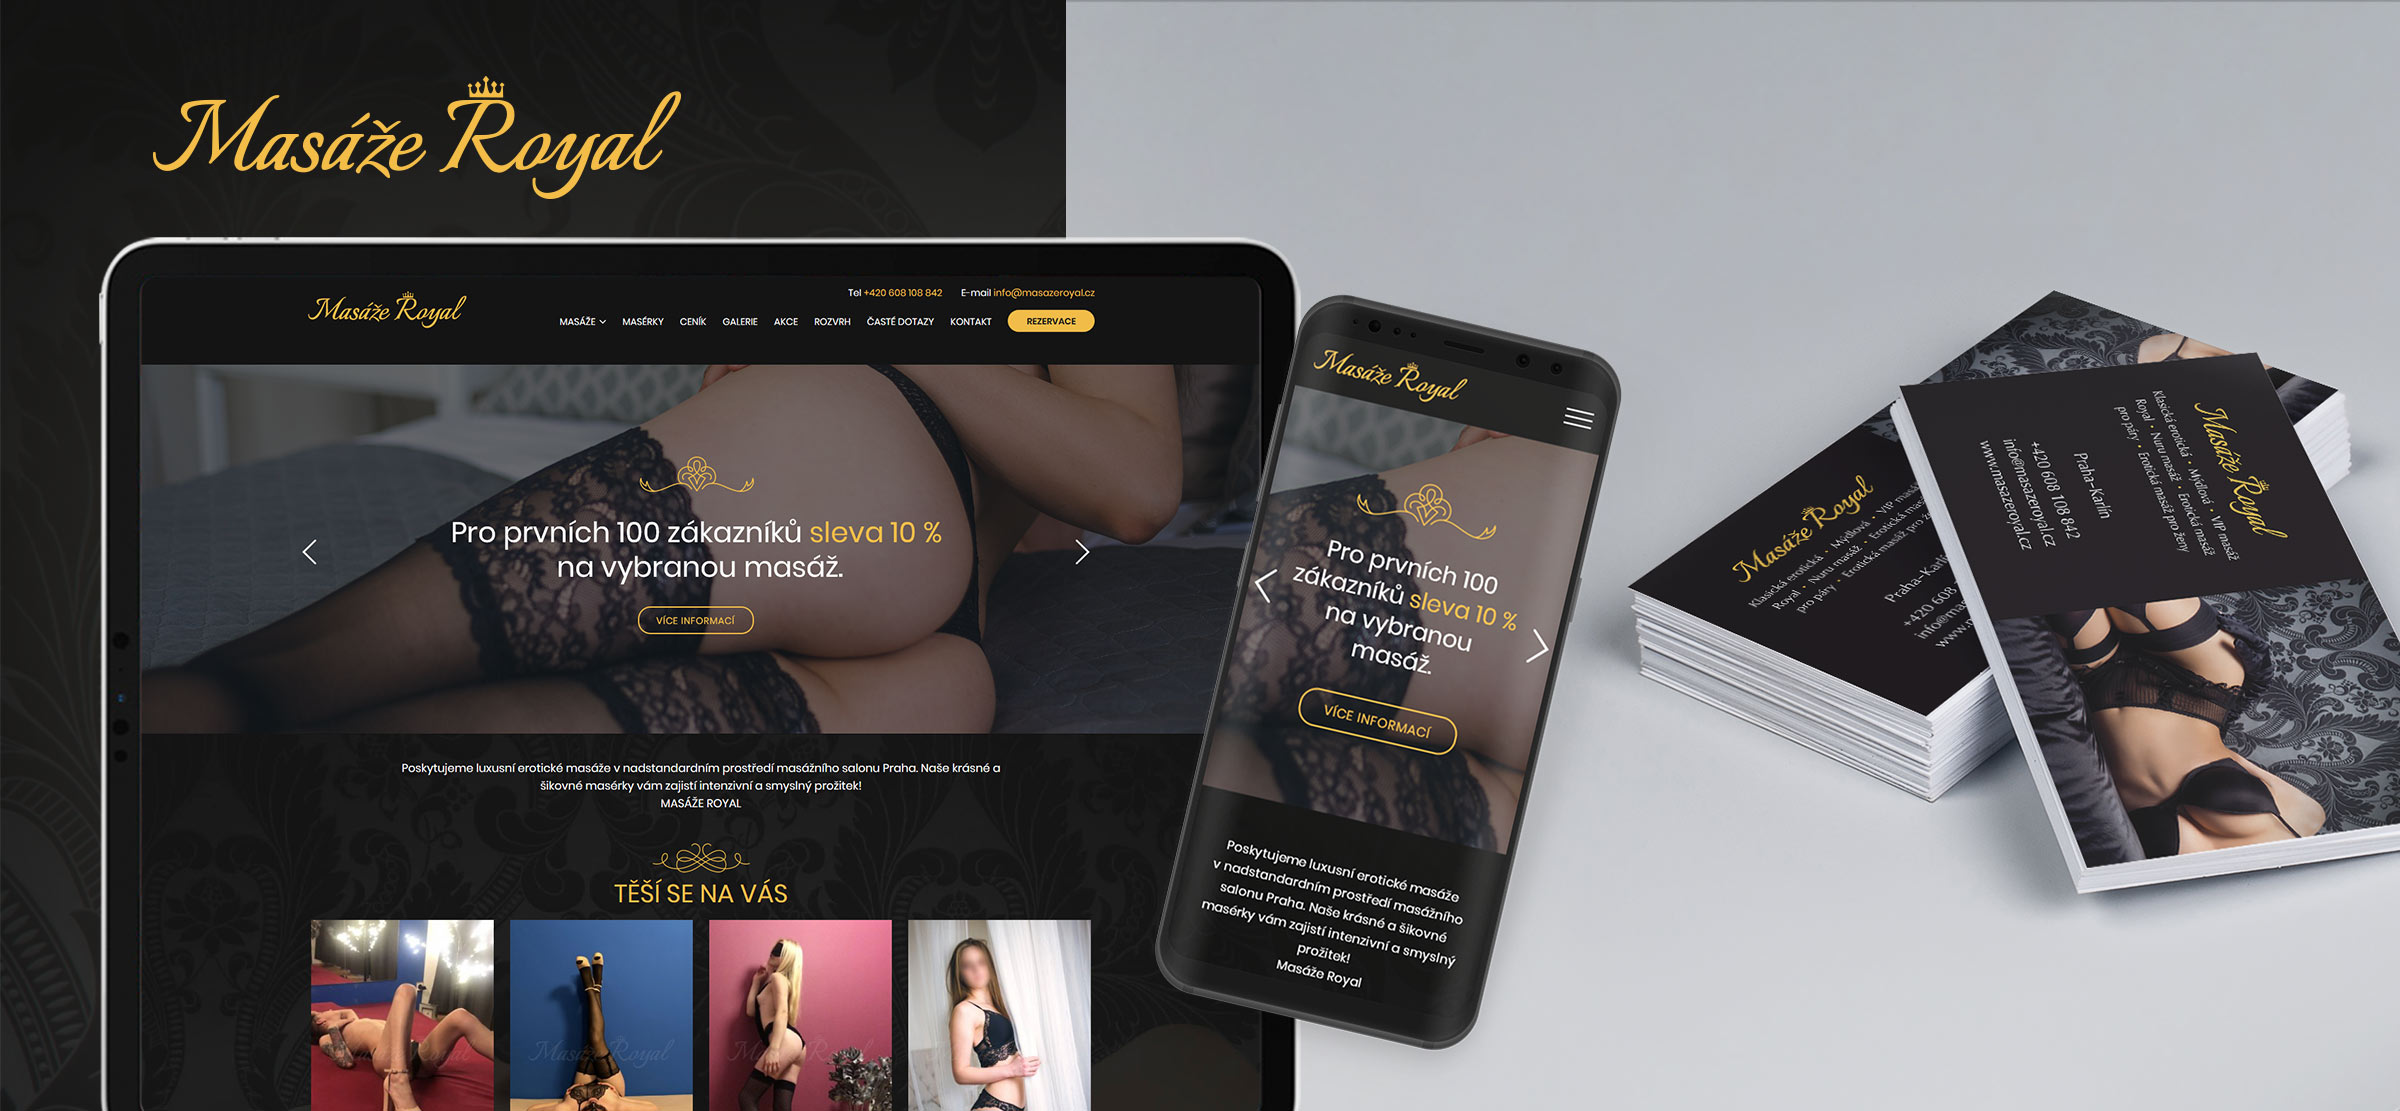 Masáže Royal - logo - web - tisk